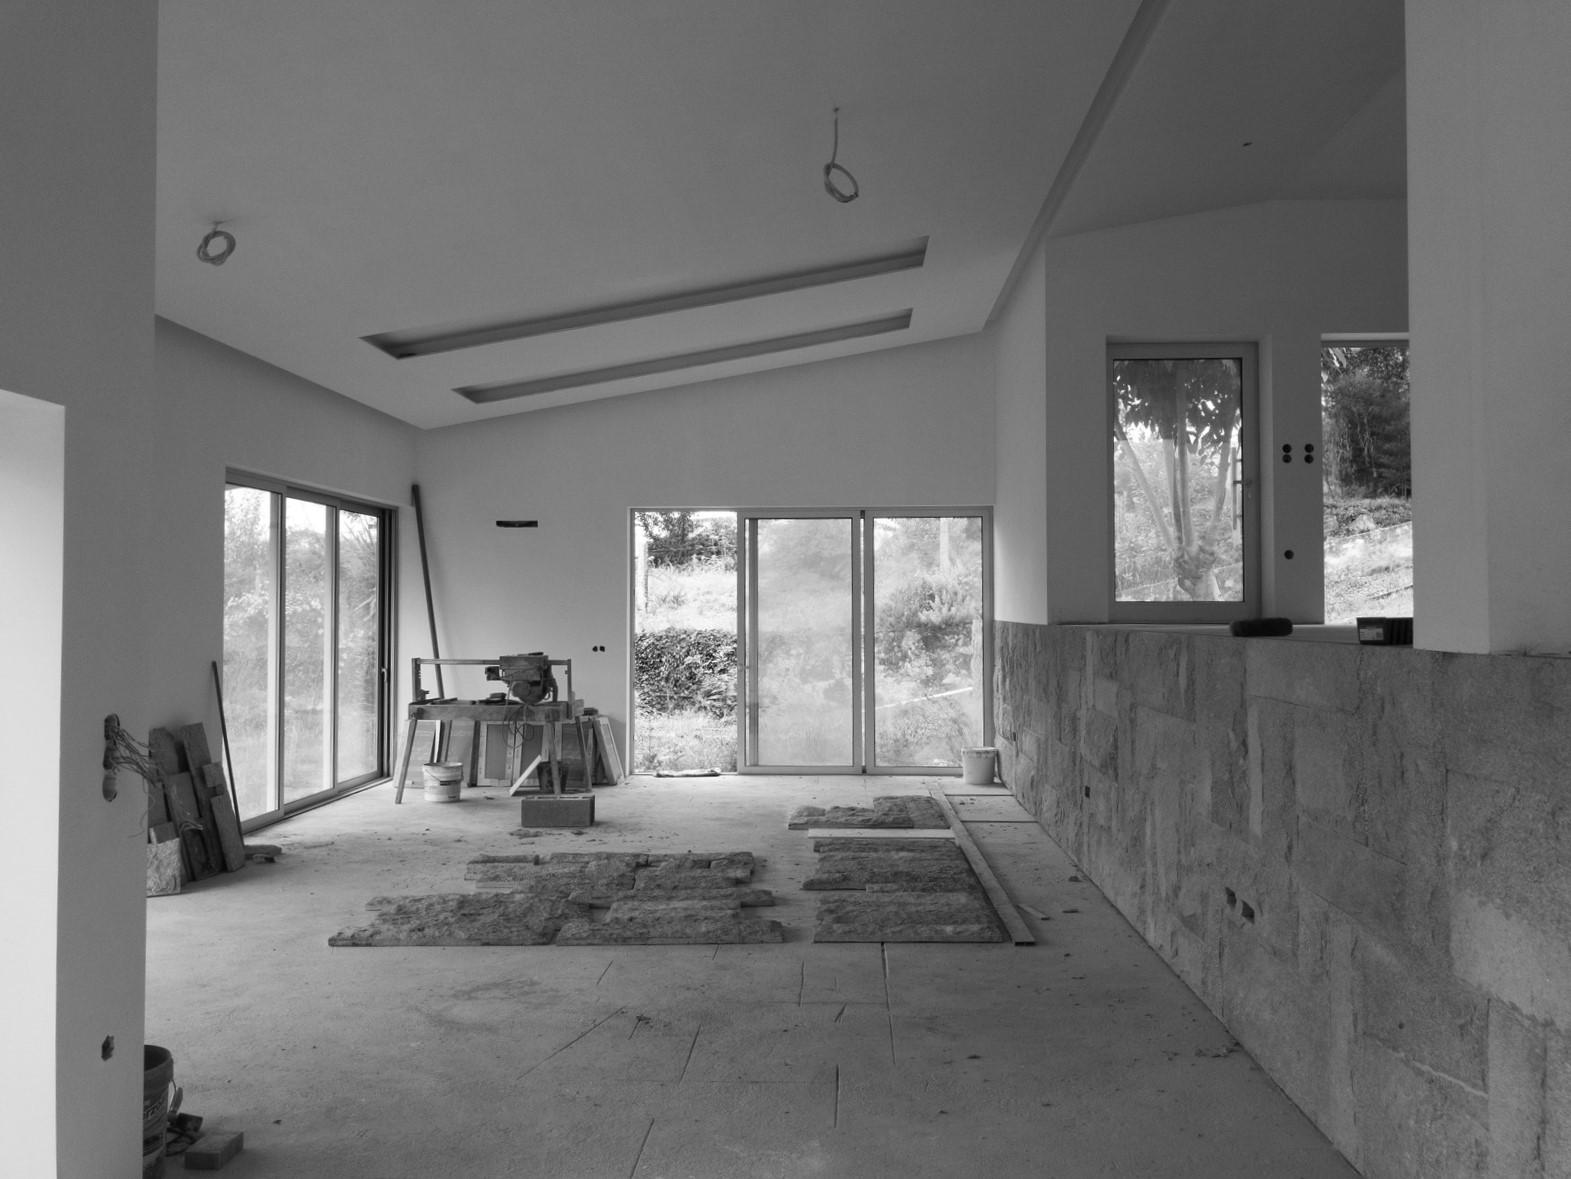 Moradia S+N - arquitectura - EVA evolutionary architecture - arquitectos porto - oliveira de azemeis (21).jpg